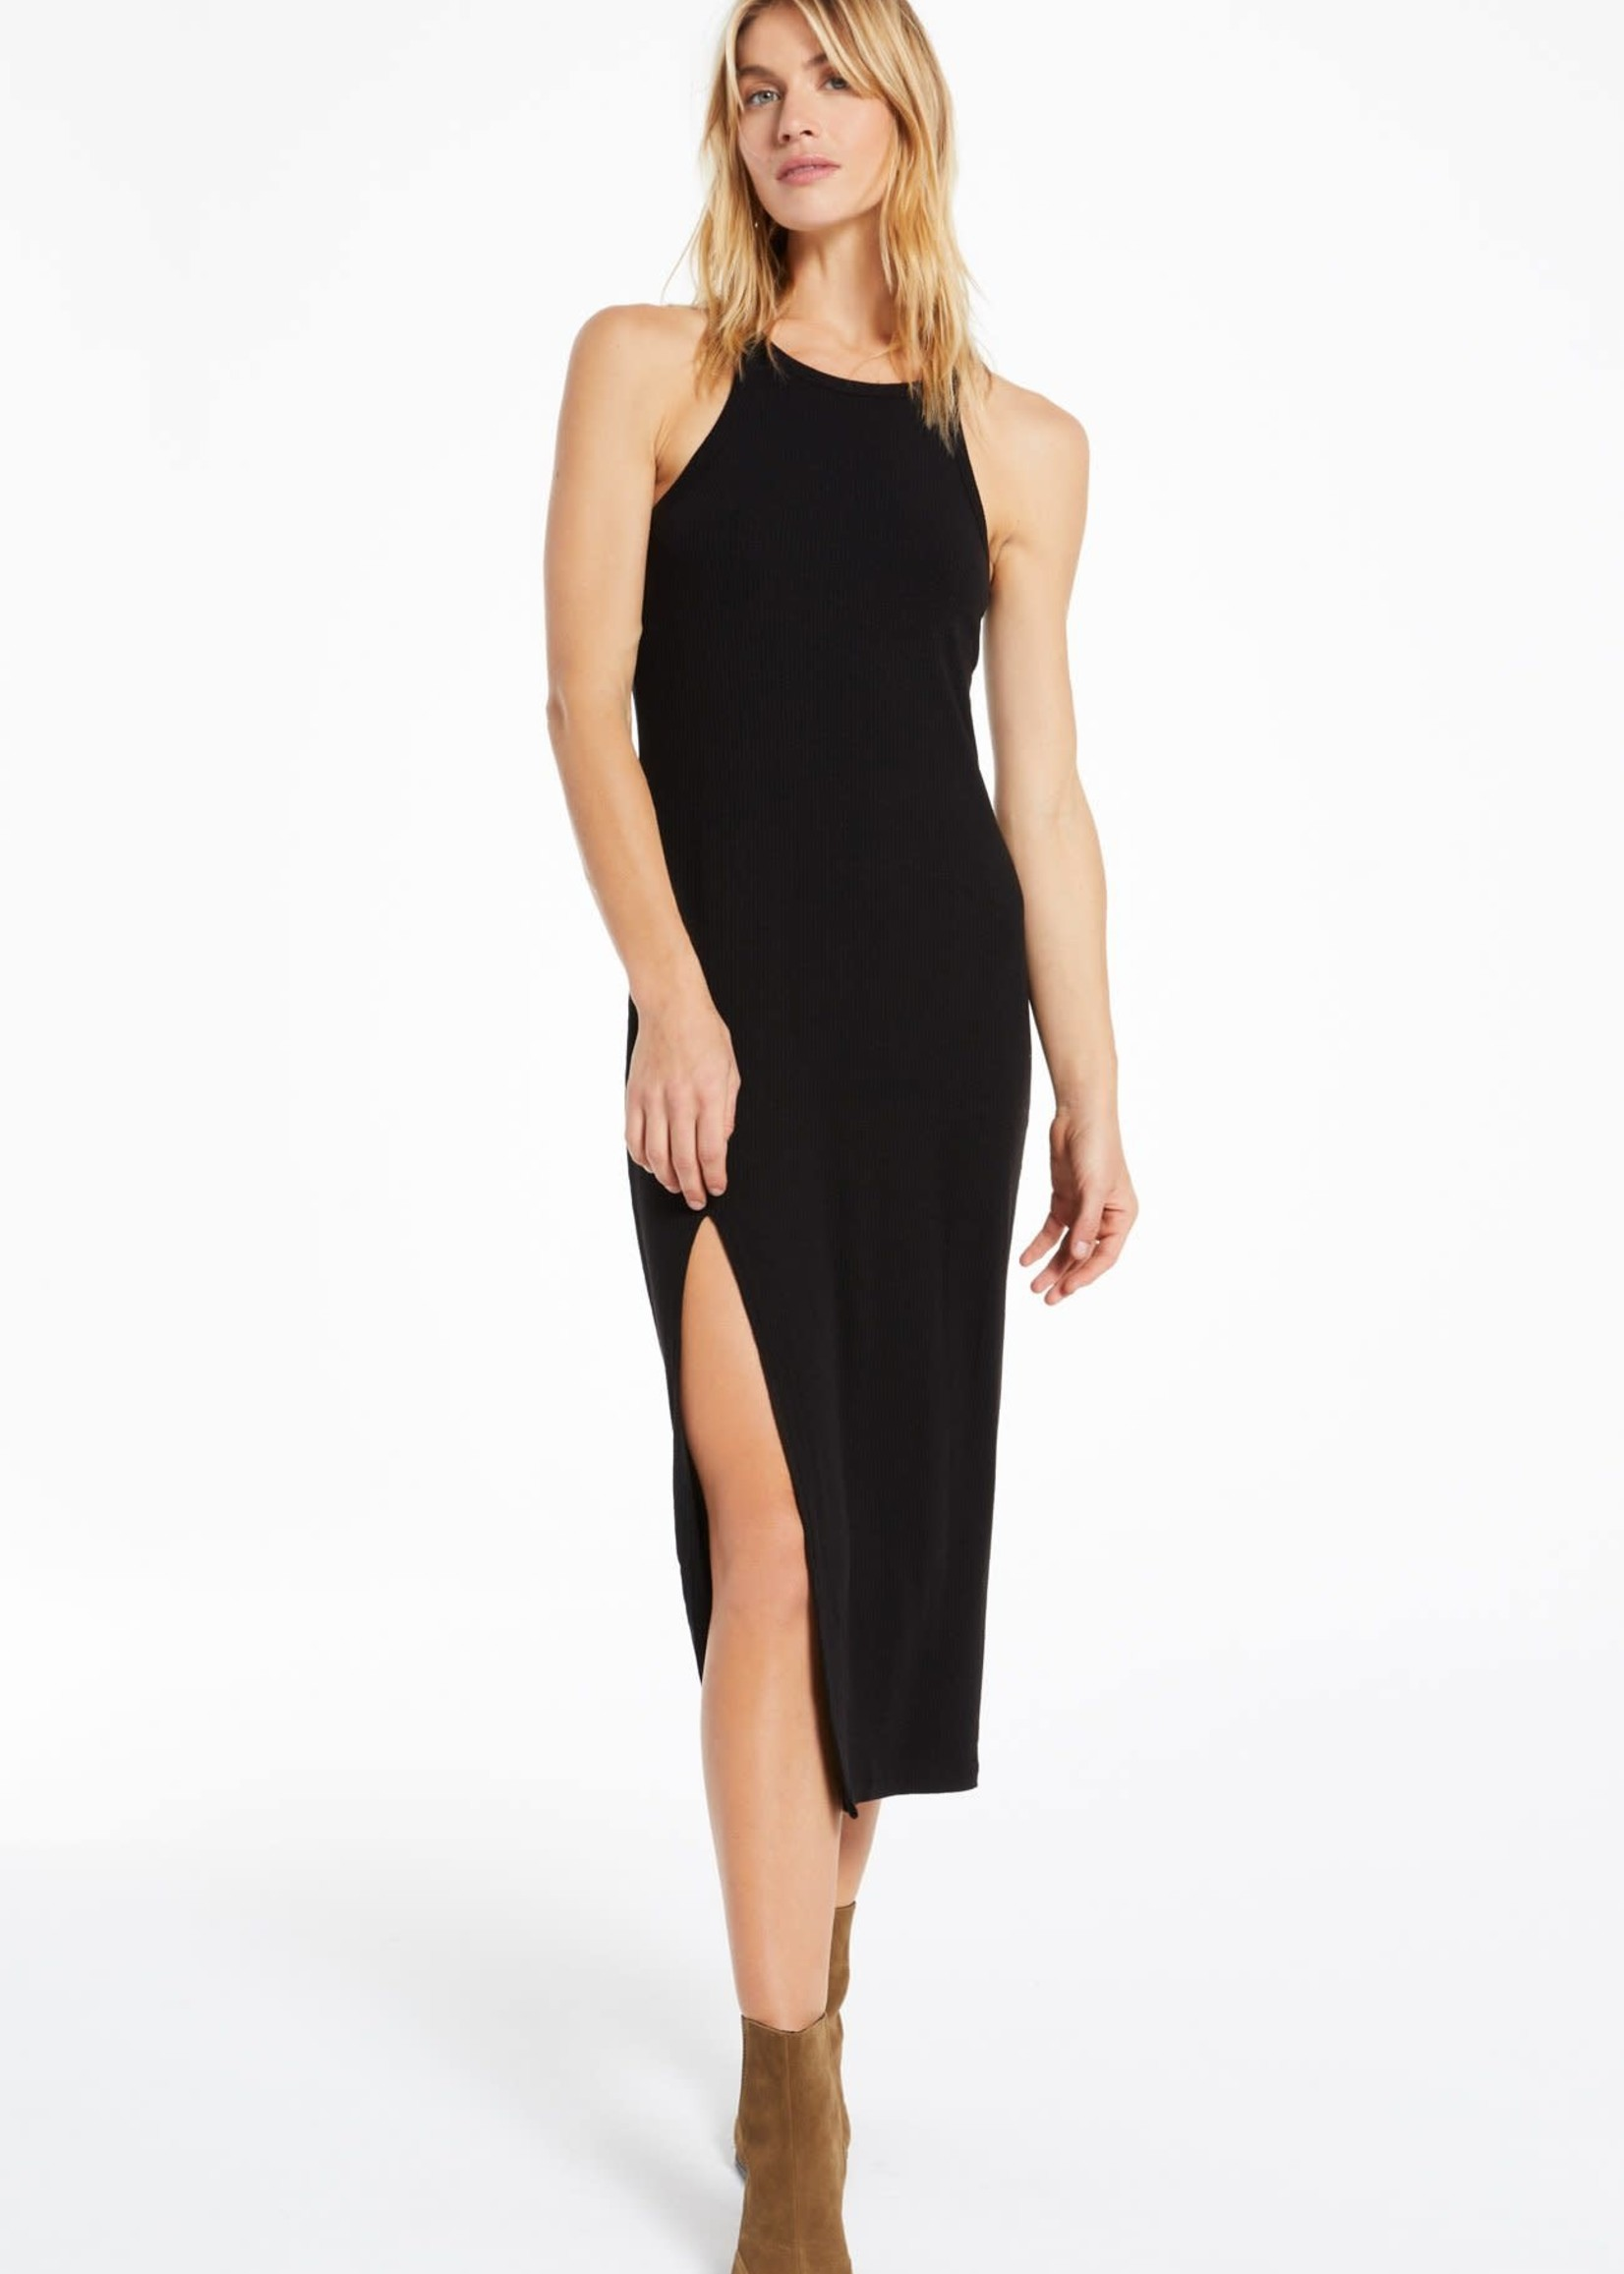 Z Supply Palisades Rib Midi Dress